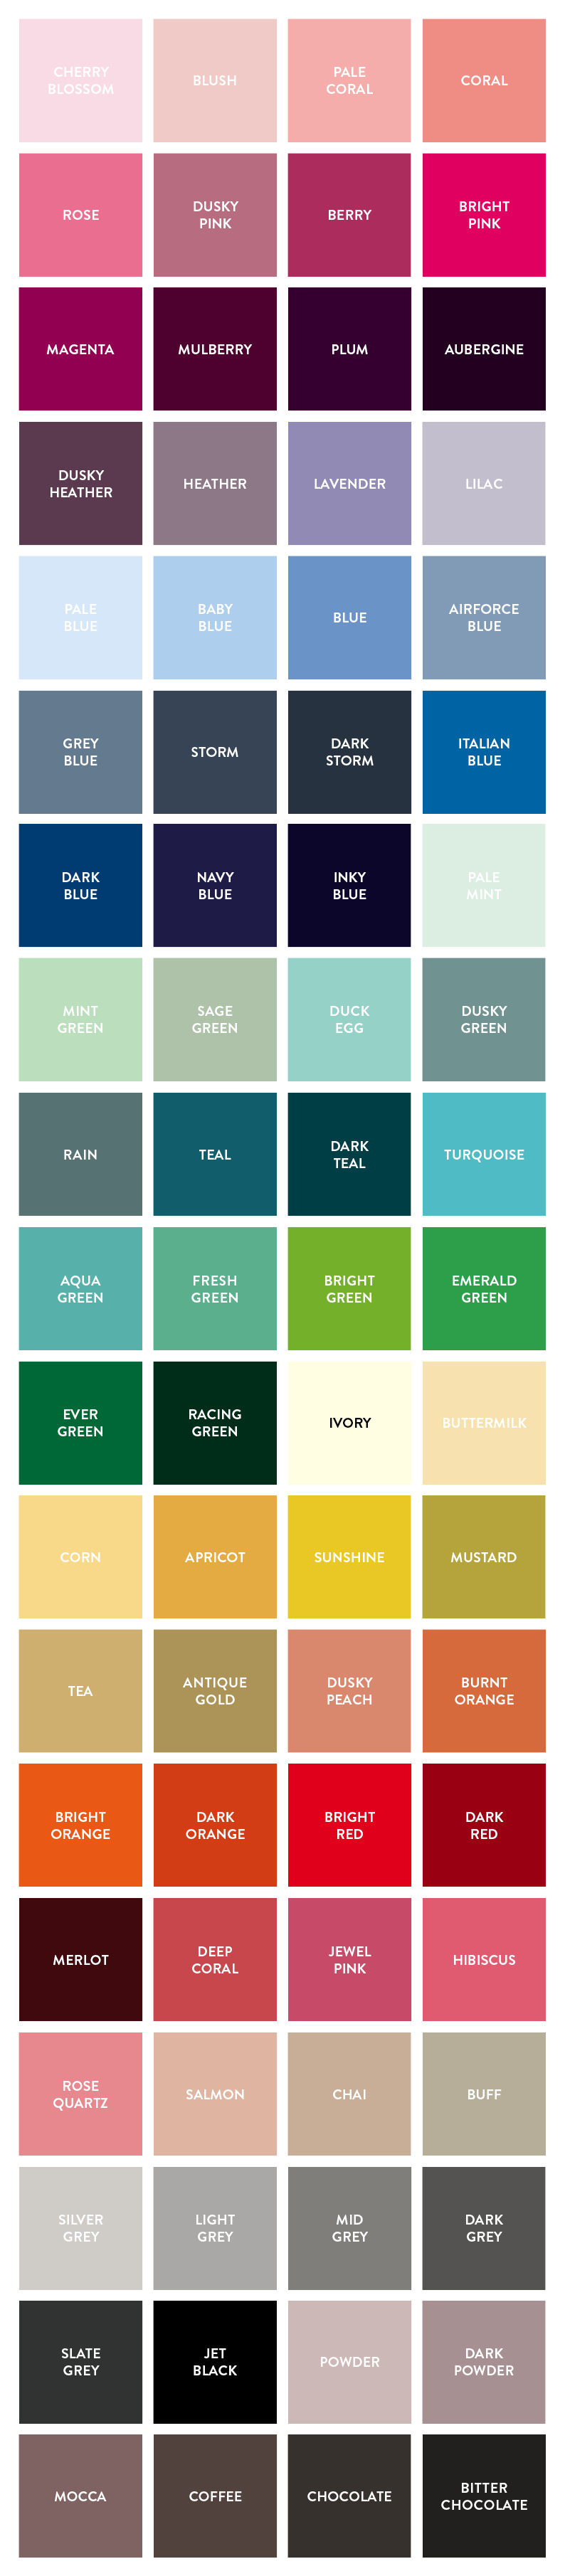 Colour_Palette.jpg